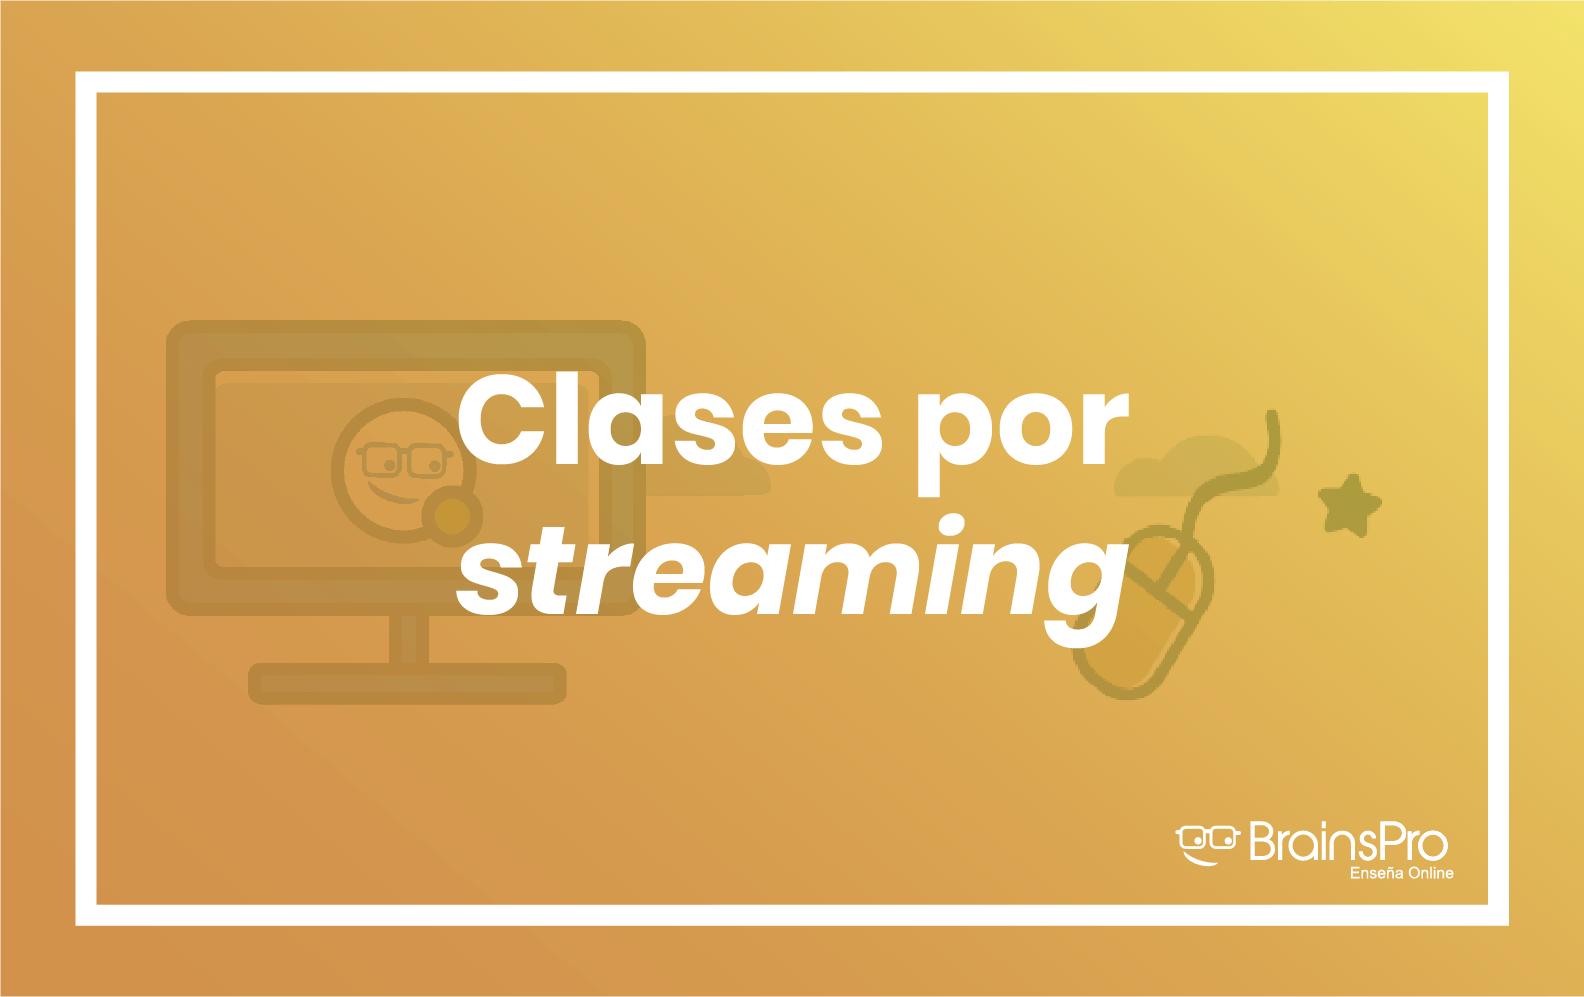 Clases por streaming